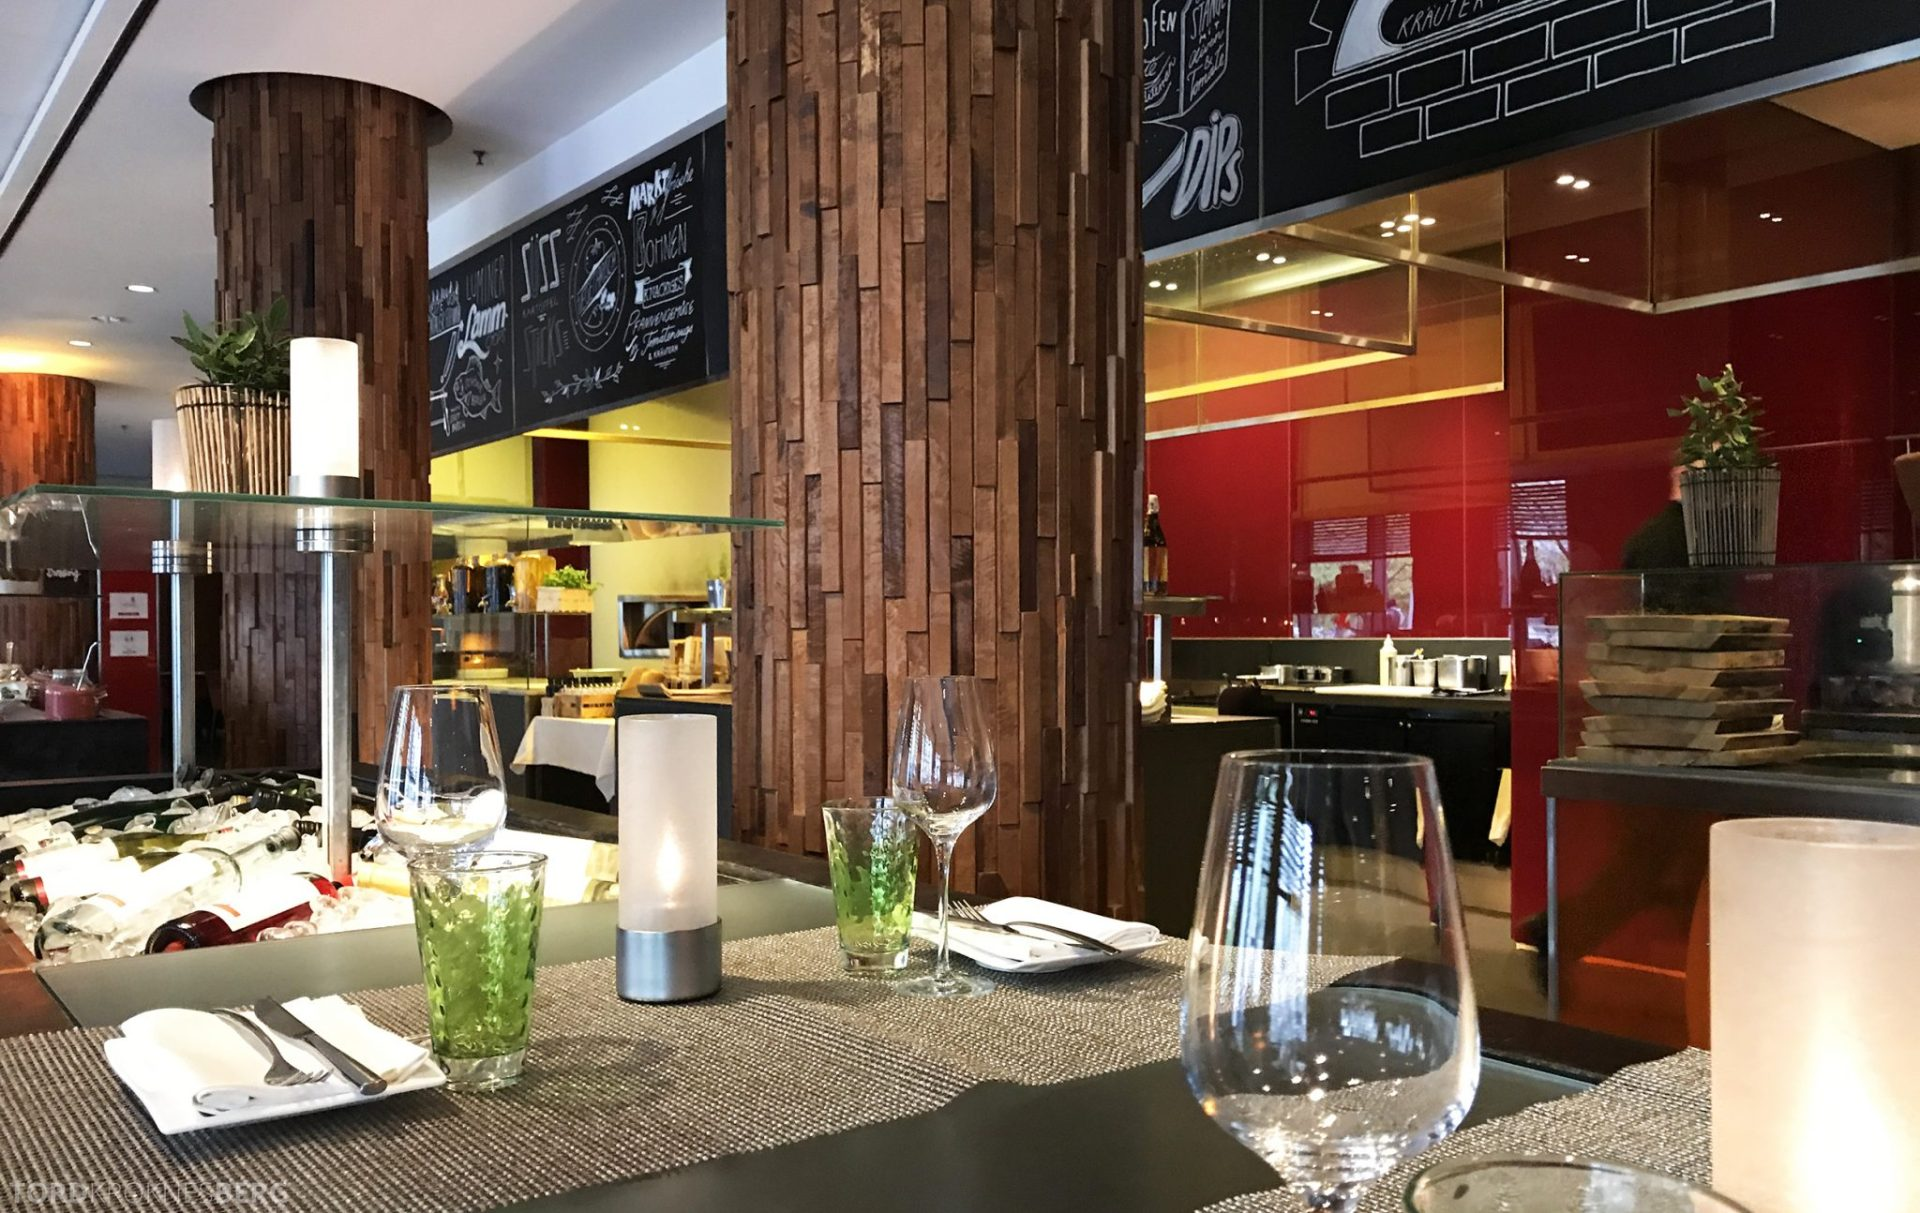 Restaurant Heat Radisson Blu Berlin detaljer